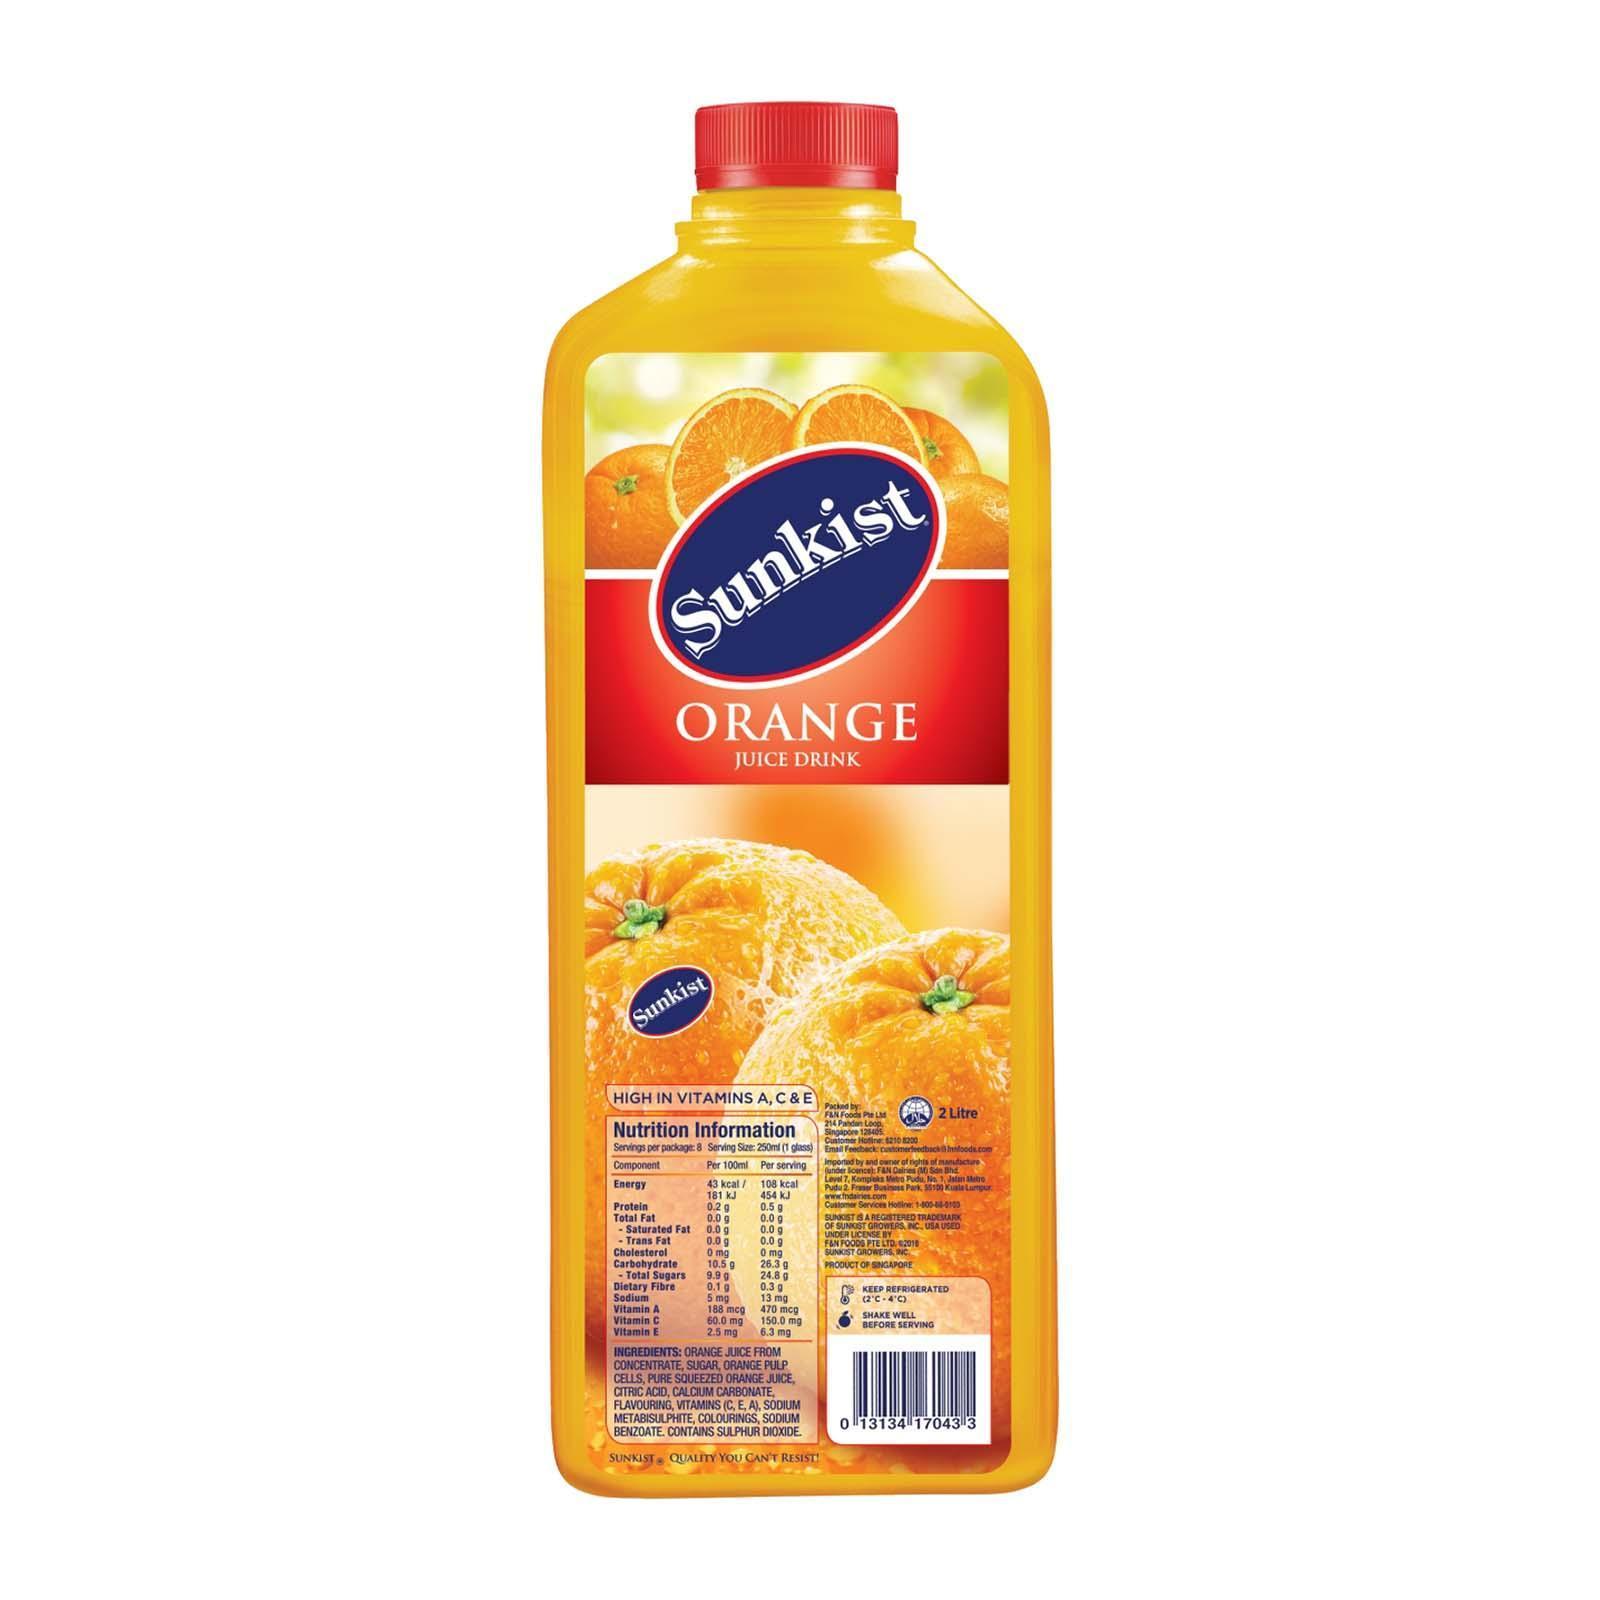 SUNKIST Orange Juice Drink 2L